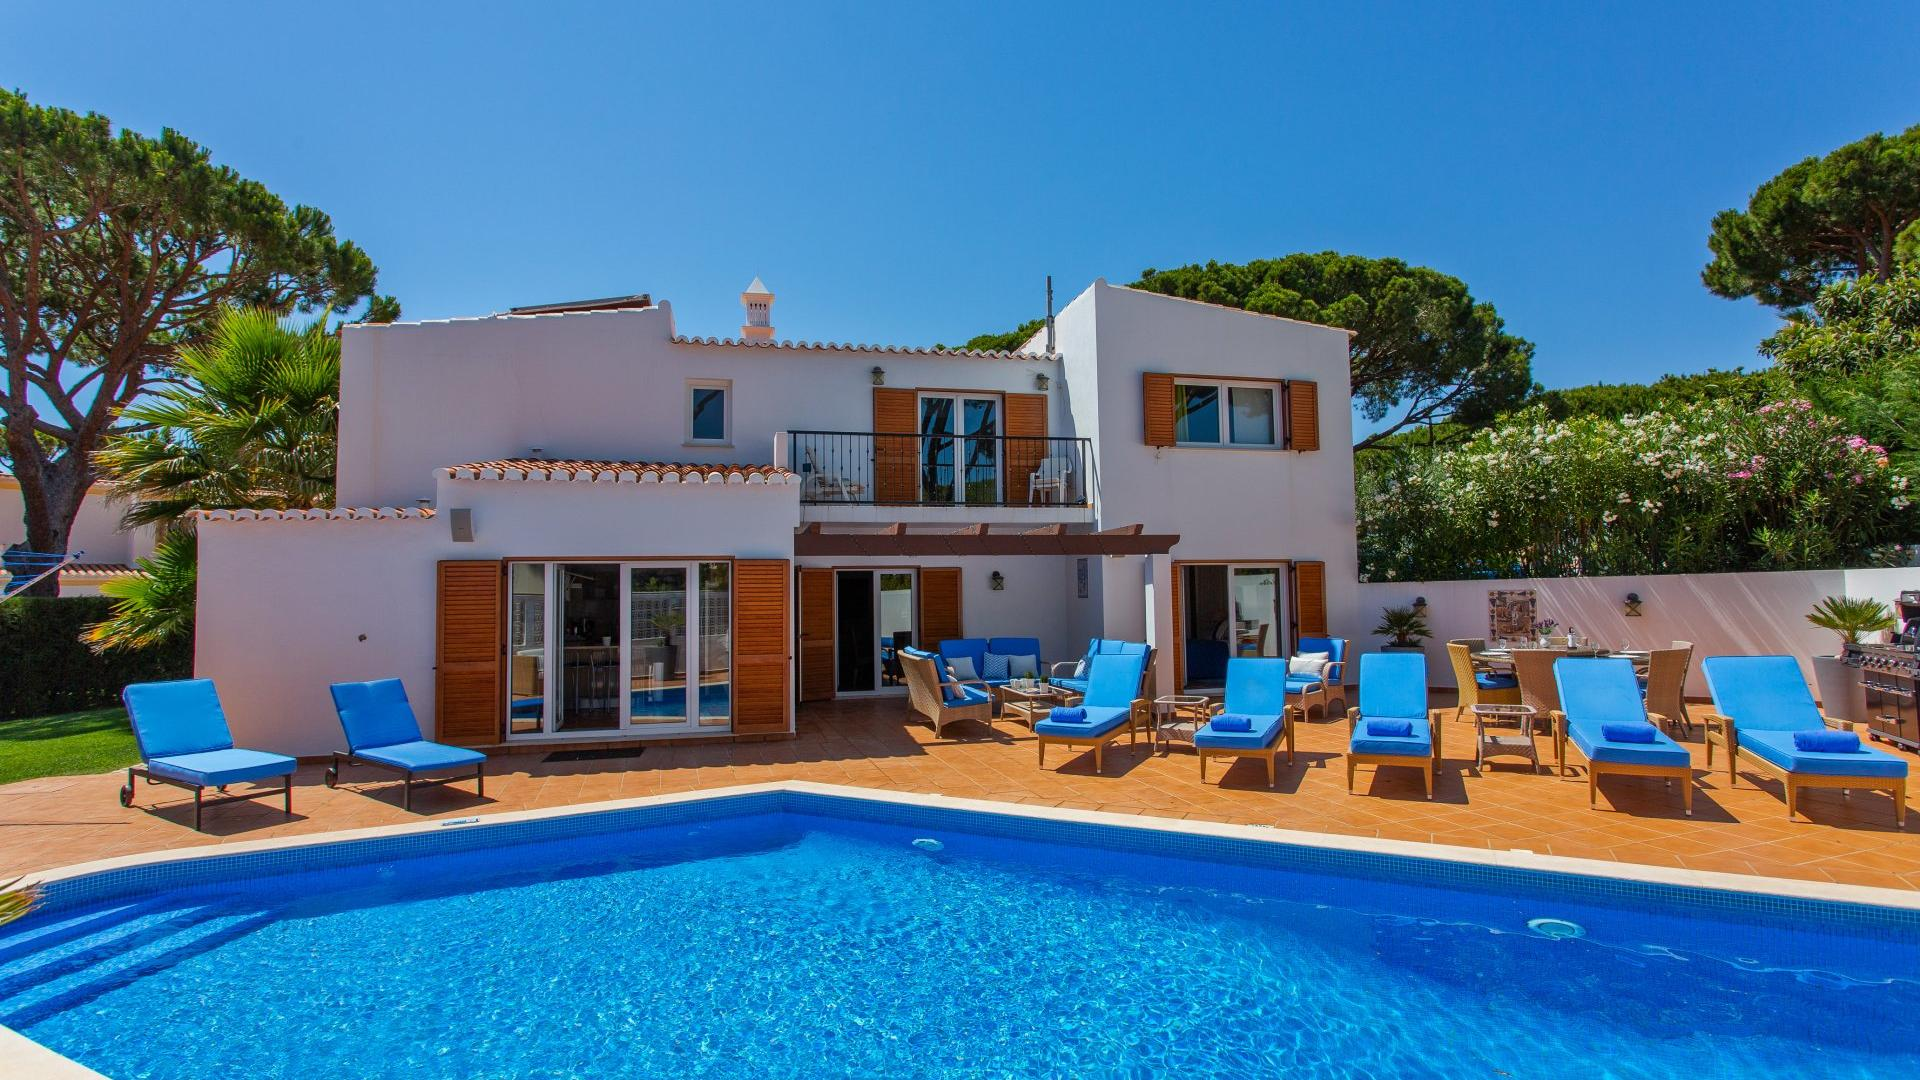 Villa Aurora - Vale do Lobo, Algarve - _O5A8997.jpg